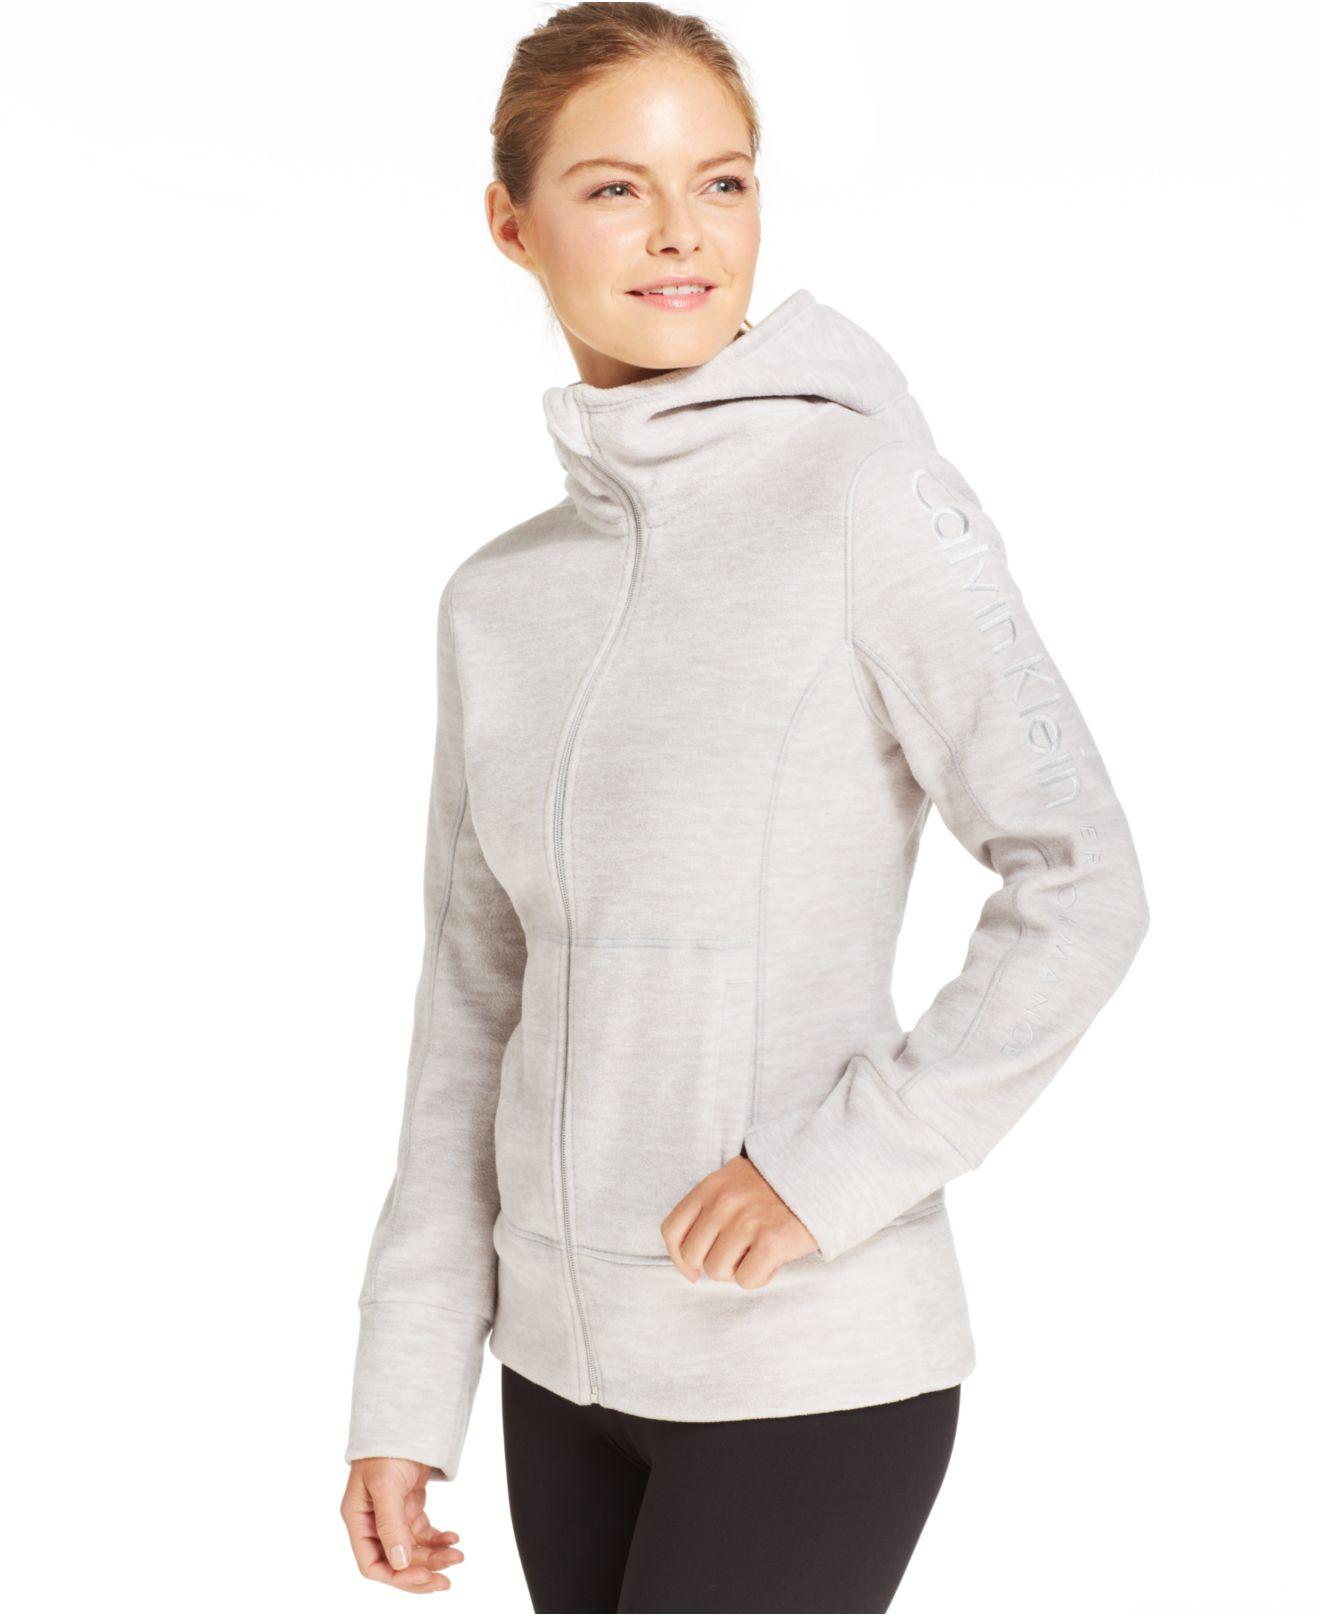 4e91a557e5d2 Lyst - Calvin Klein Performance Logo Zip-Up Hoodie in White